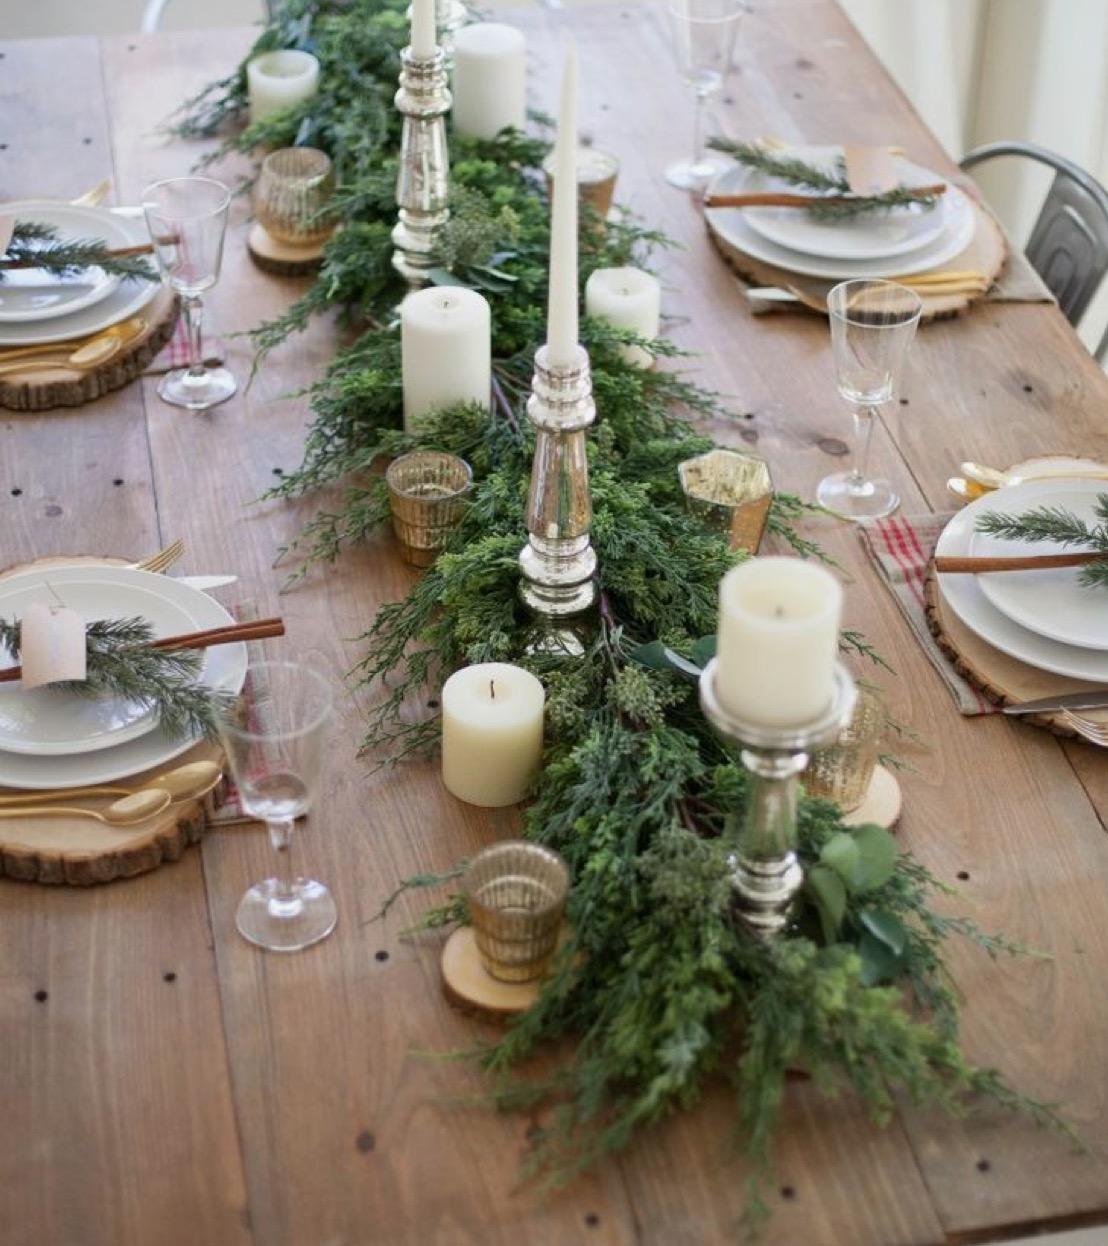 festive-table-setting